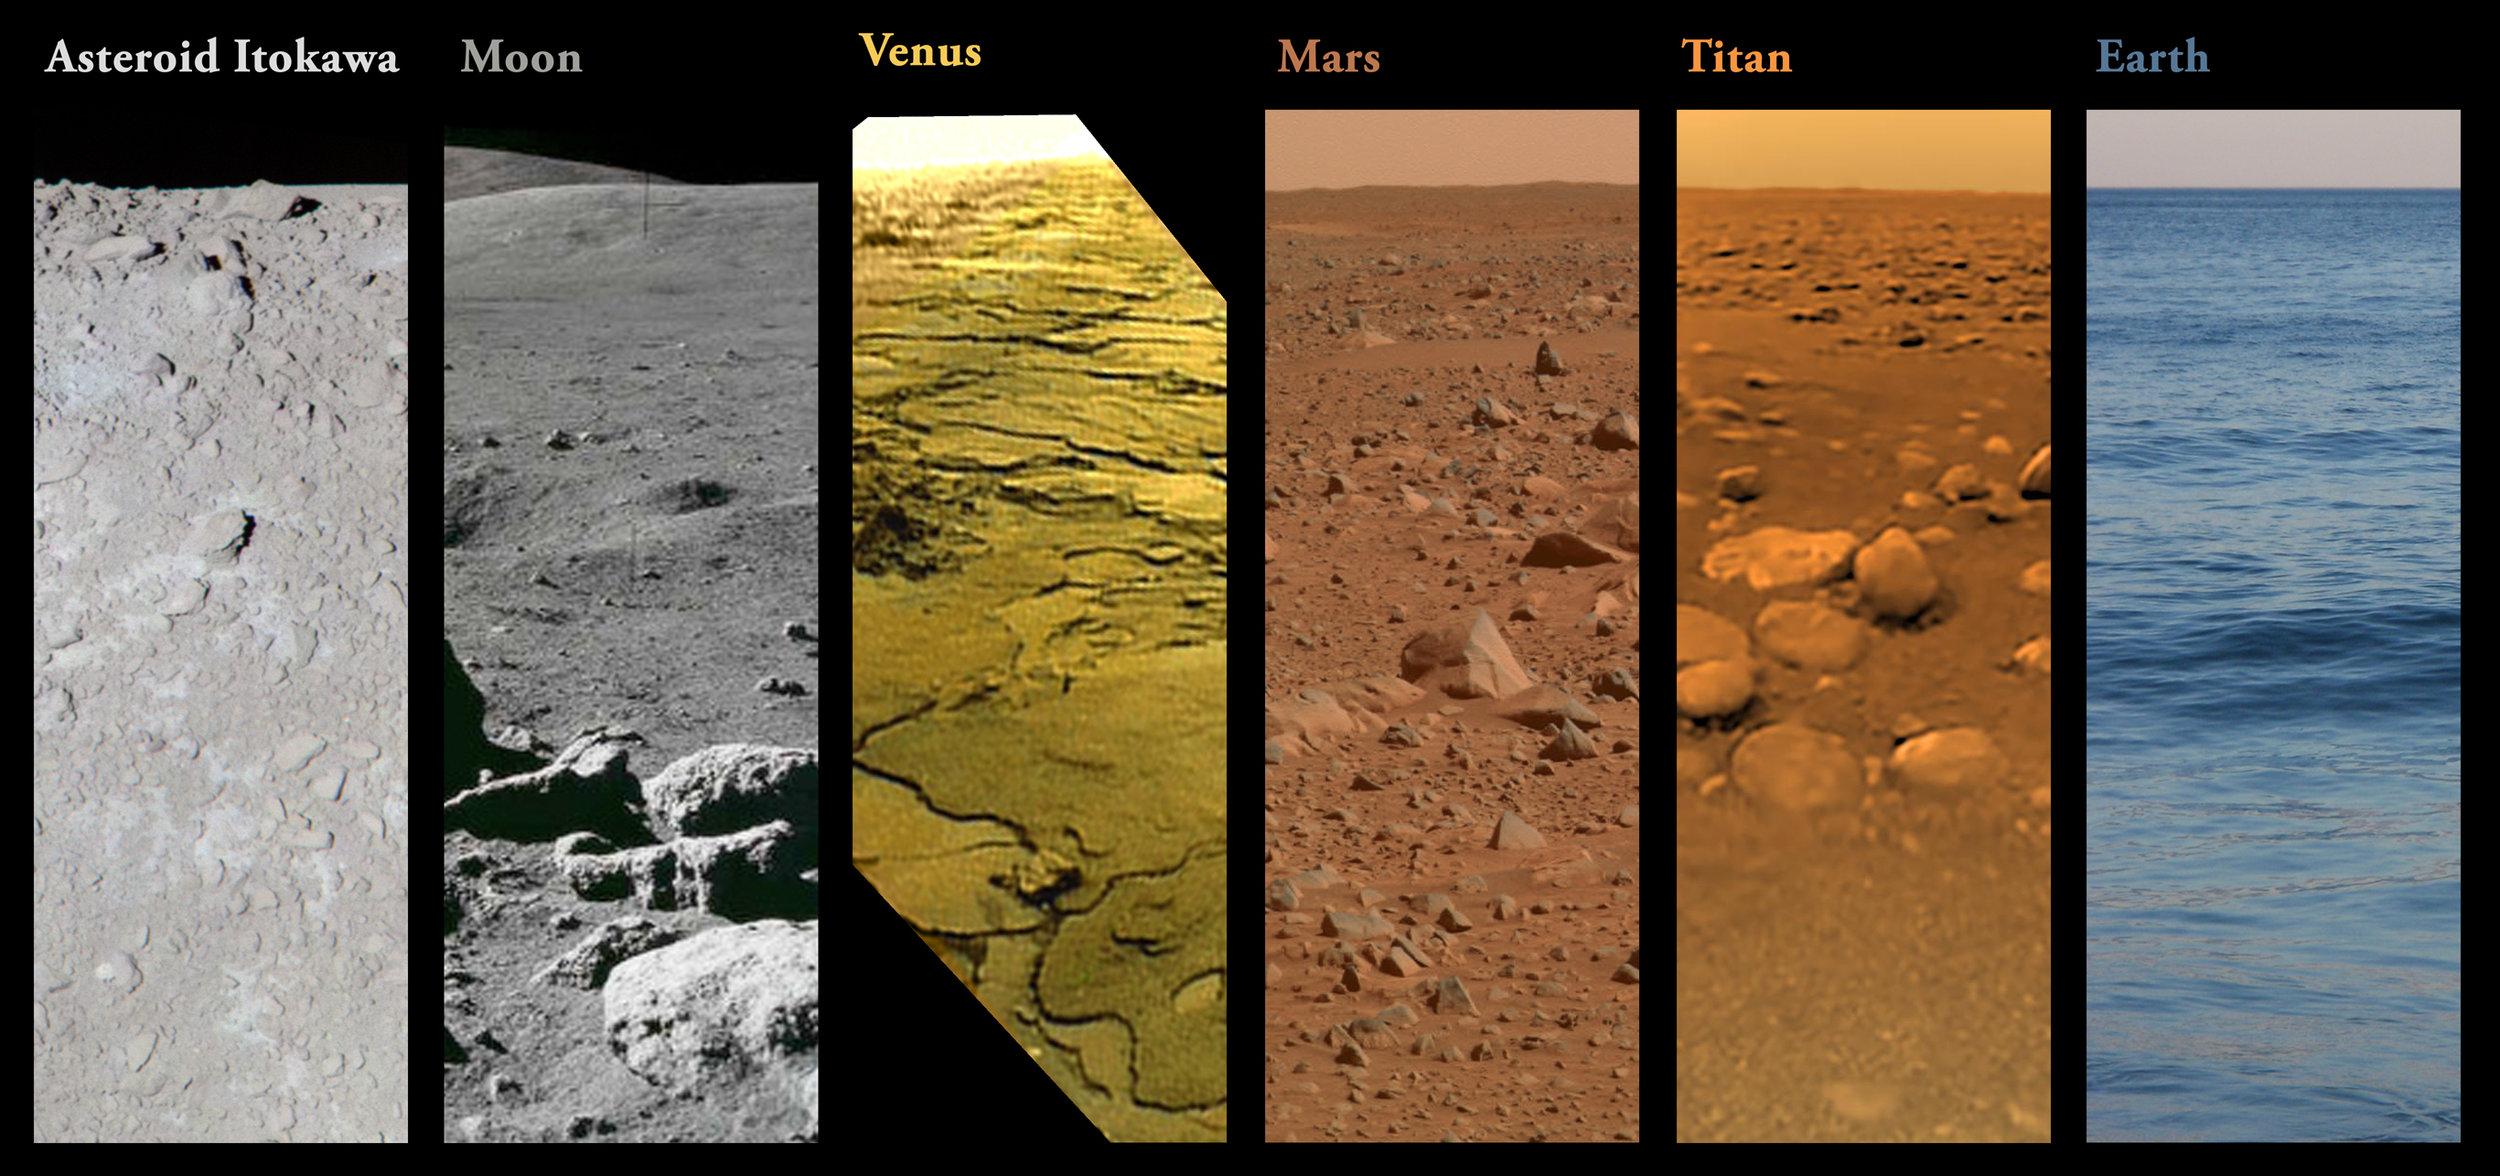 Mike Malaska,  Distant Horizons: Different Surfaces.  Image Credits: Asteroid Itokawa: ISAS / JAXA / Gordan Ugarkovic. Moon: NASA. Venus: IKI / Don Mitchell / Ted Stryk / Mike Malaska. Mars: NASA / JPL / Cornell / Mike Malaska. Titan: ESA / NASA / JPL / University of Arizona. Earth: Mike Malaska. Composition by Mike Malaska.Source: https://www.jpl.nasa.gov/infographics/infographic.view.php?id=10790